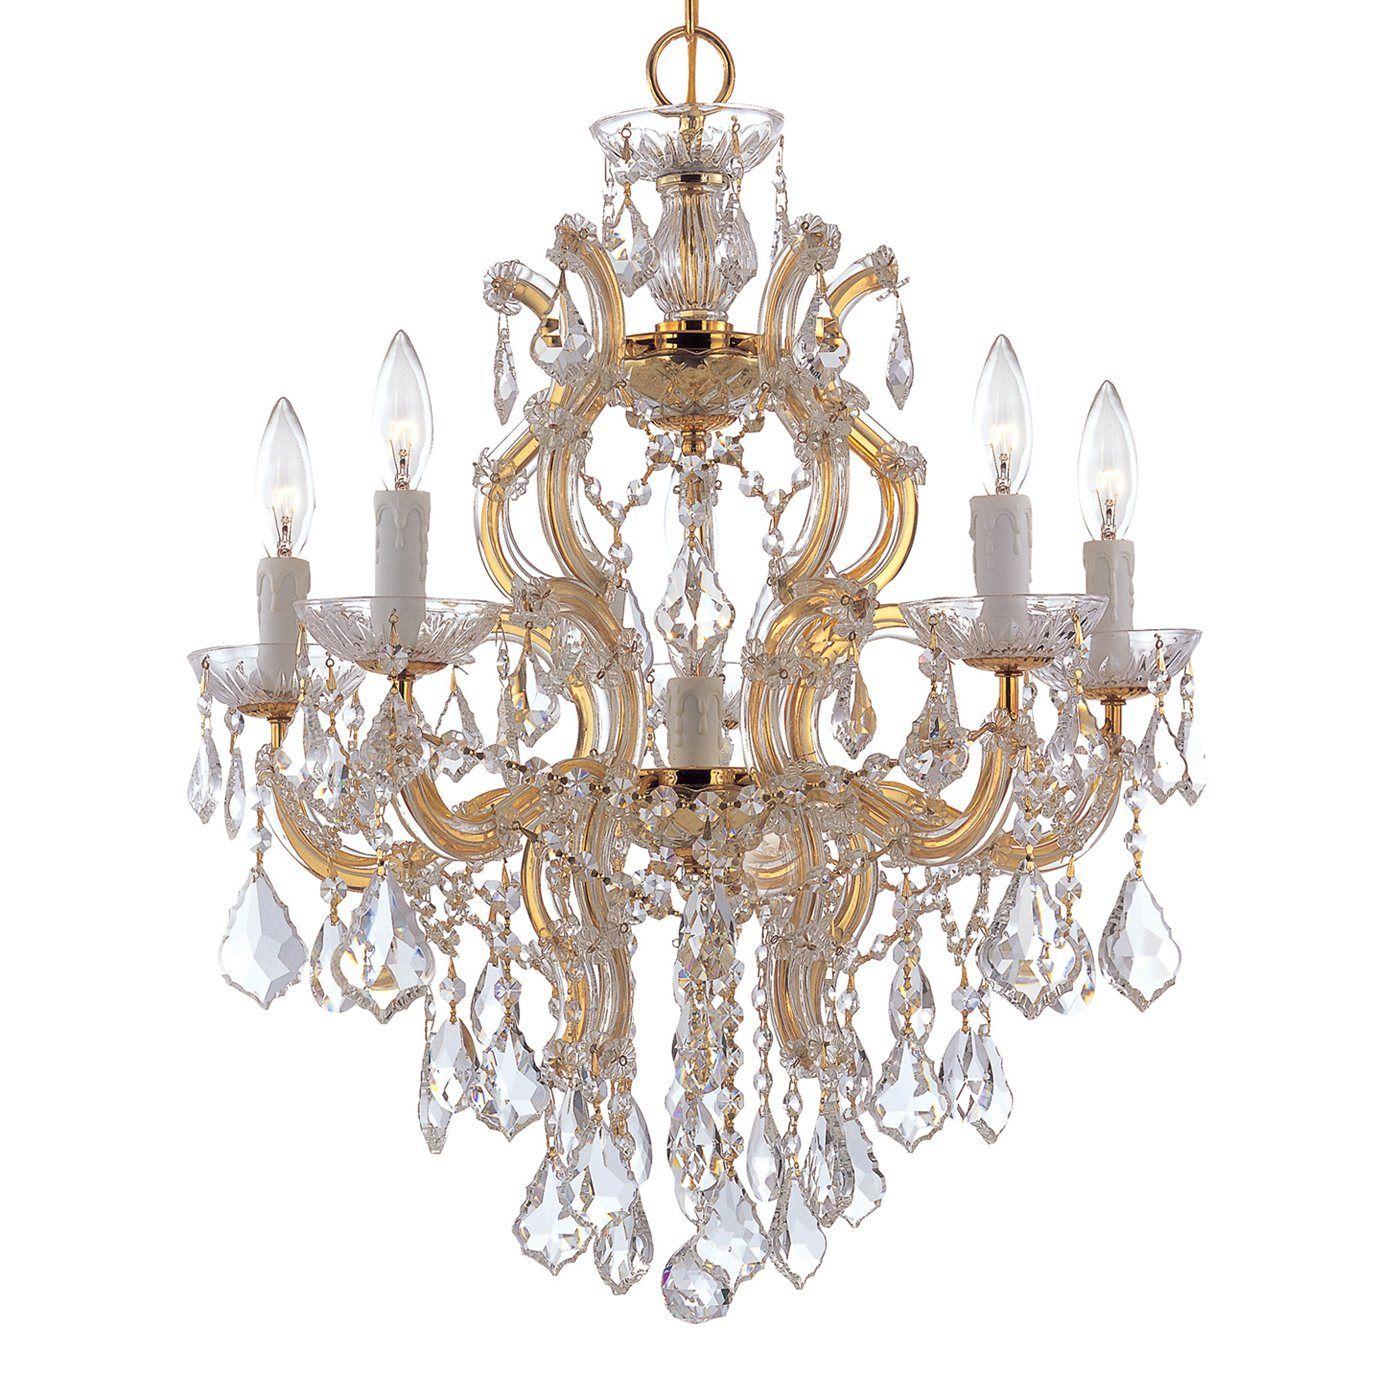 Crystorama Lighting 4435 Maria Theresa Chandelier Lighting